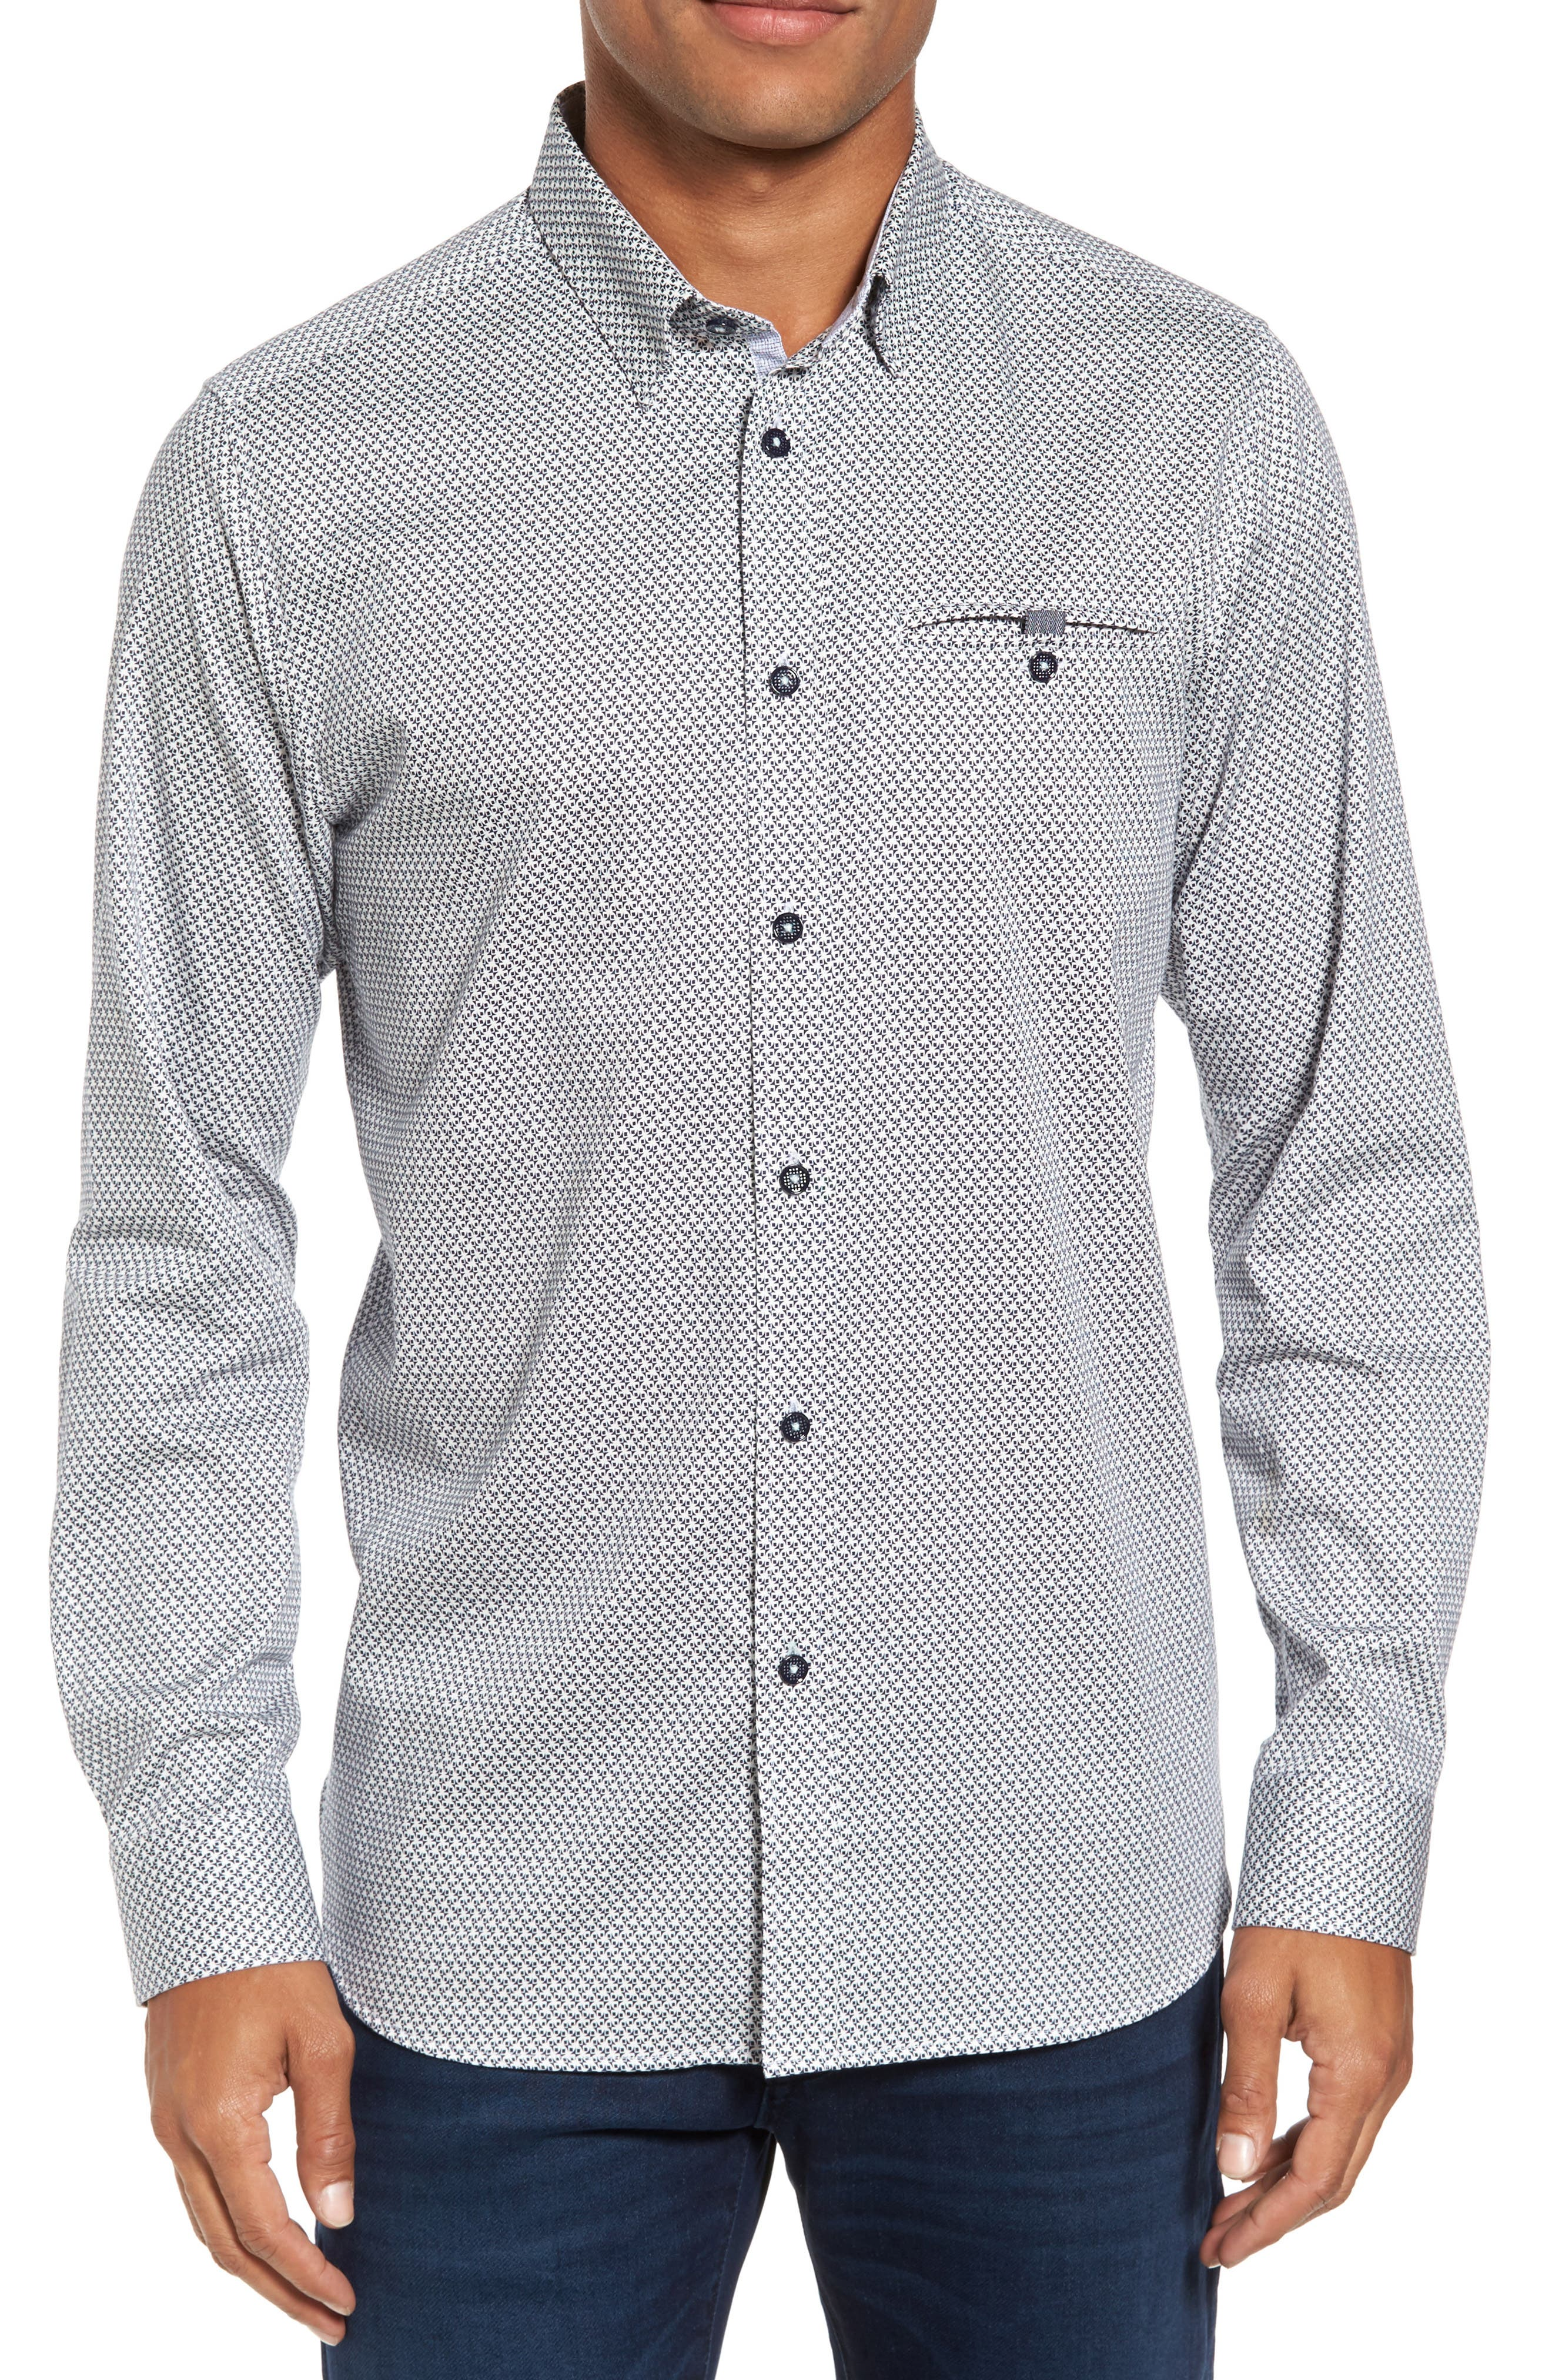 Alternate Image 1 Selected - Ted Baker London Vilamor Extra Slim Fit Print Sport Shirt